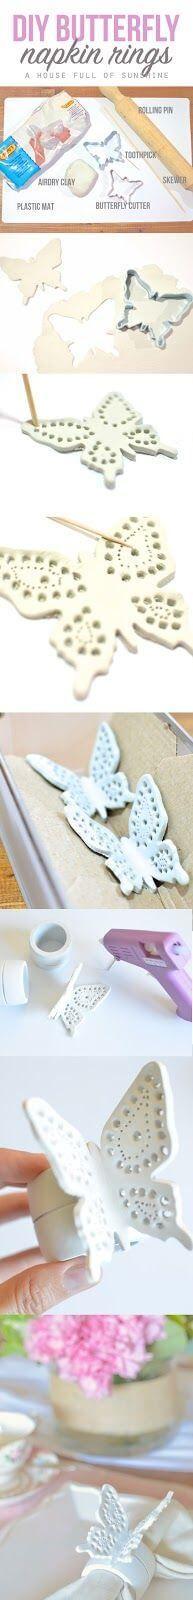 nice Easy DIY Filigree Butterfly Napkin Rings